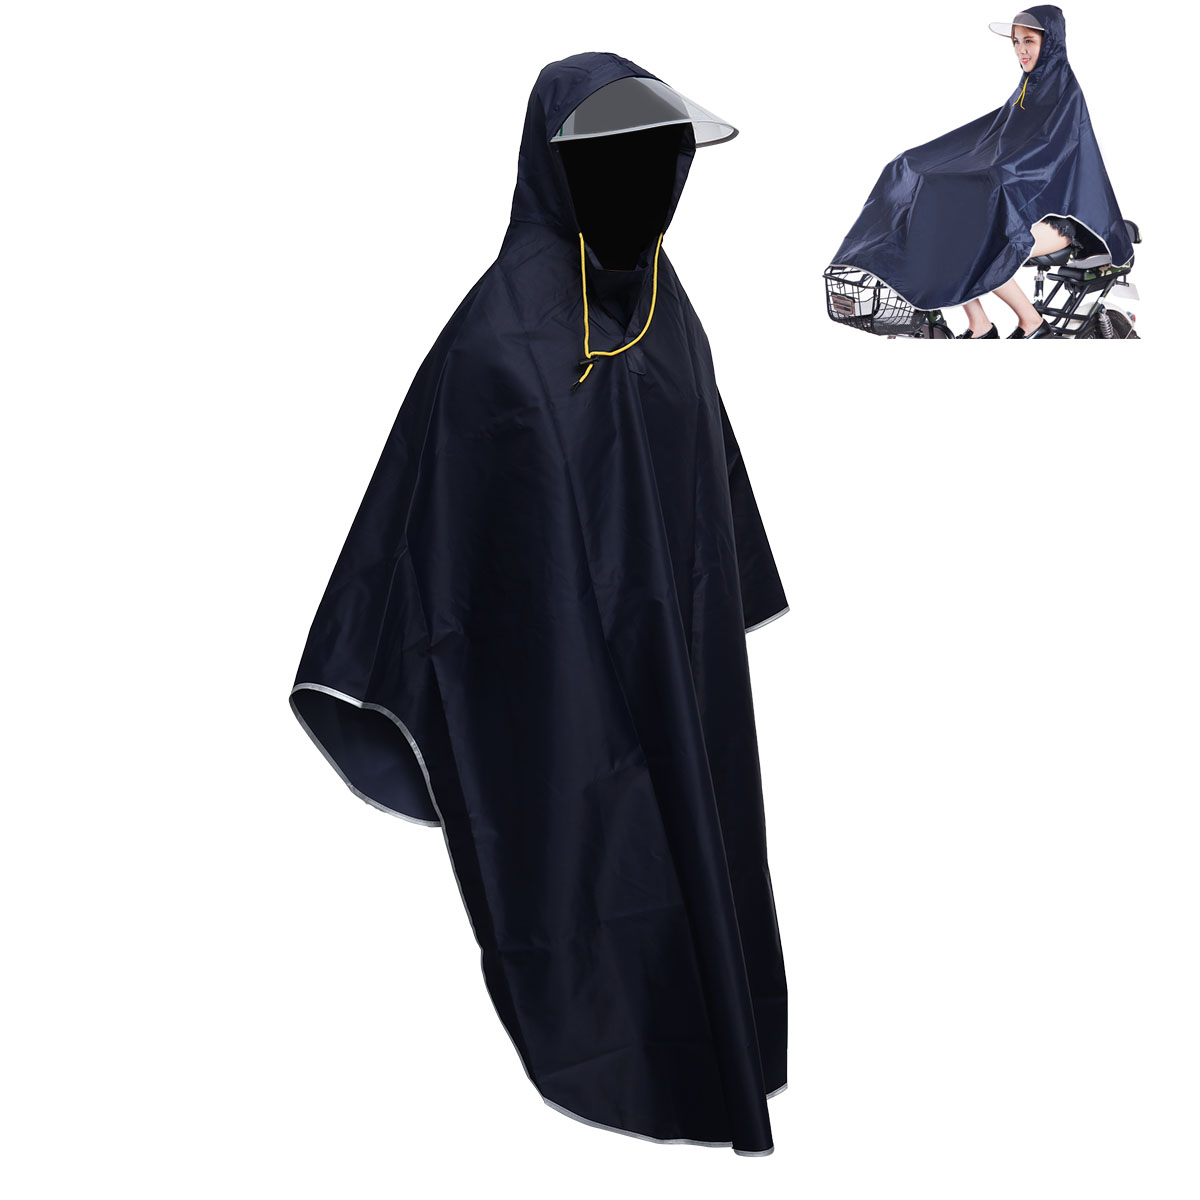 Raincoat Waterproof Men Lightweight Hooded Loose Fit Jacket Long Rain Coat Cover